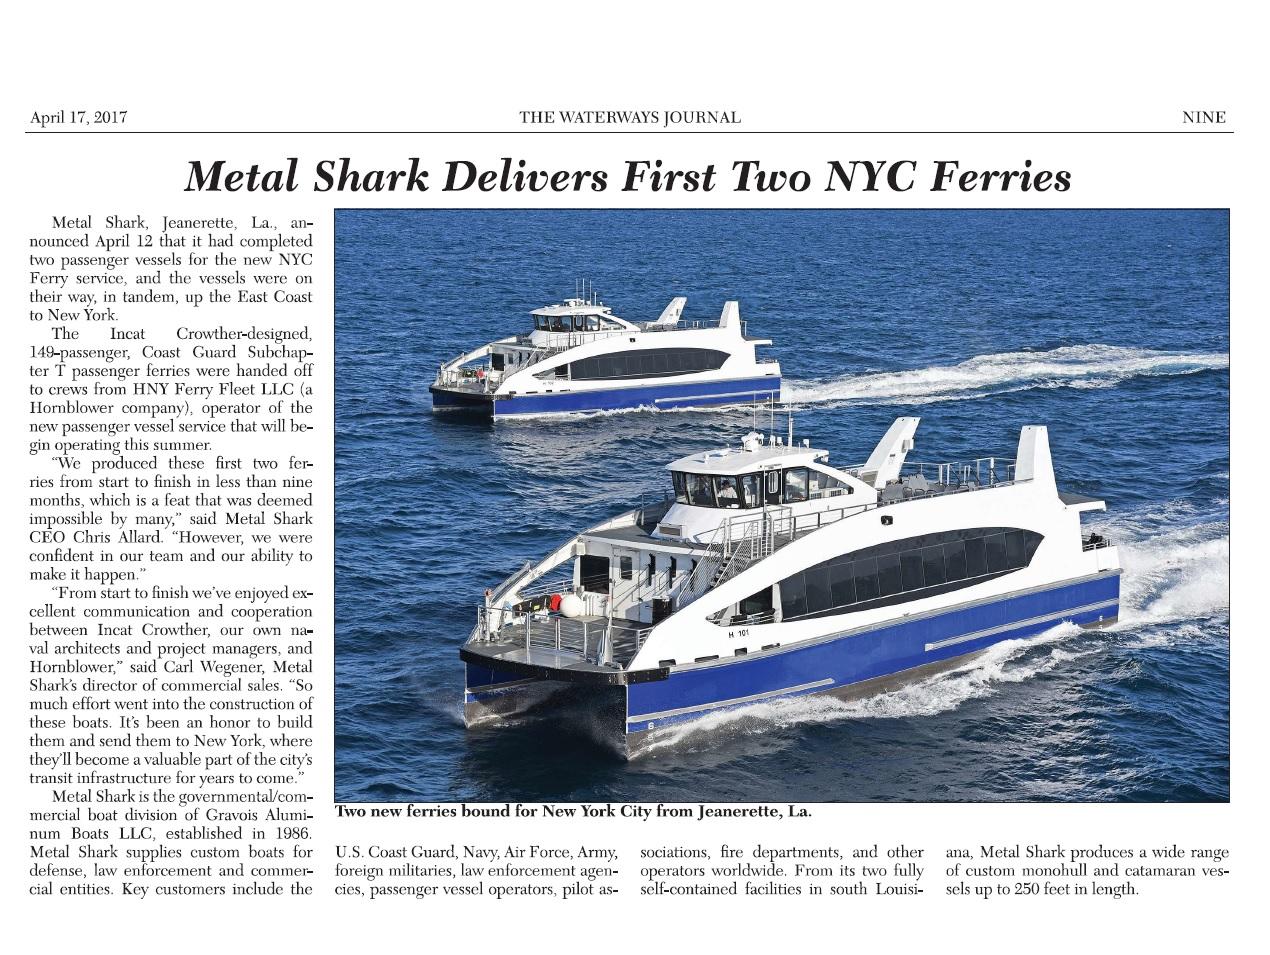 METAL SHARK FERRIES